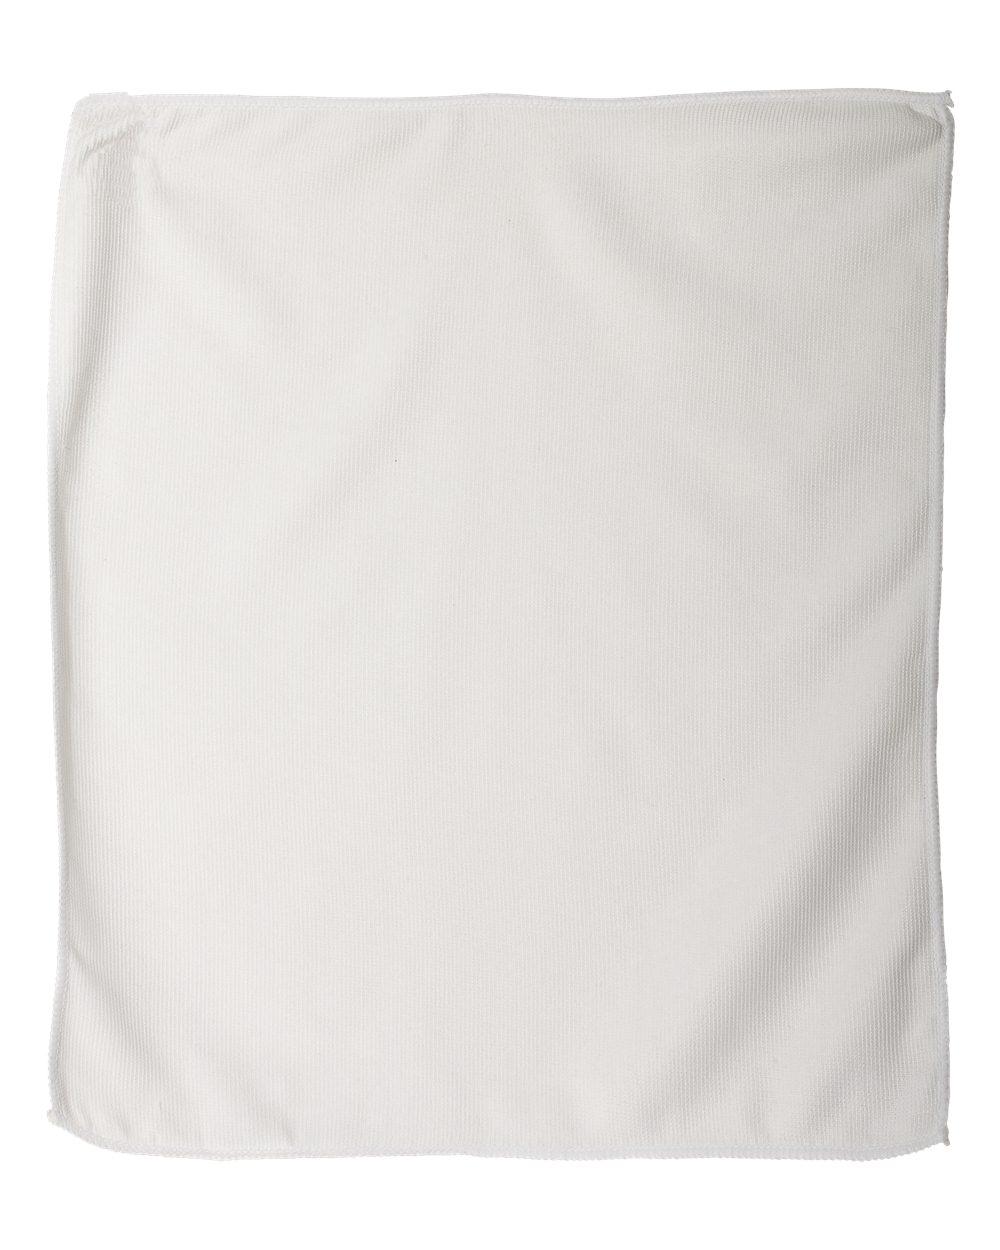 Carmel Towel Company Microfiber Rally Towel - C1118M